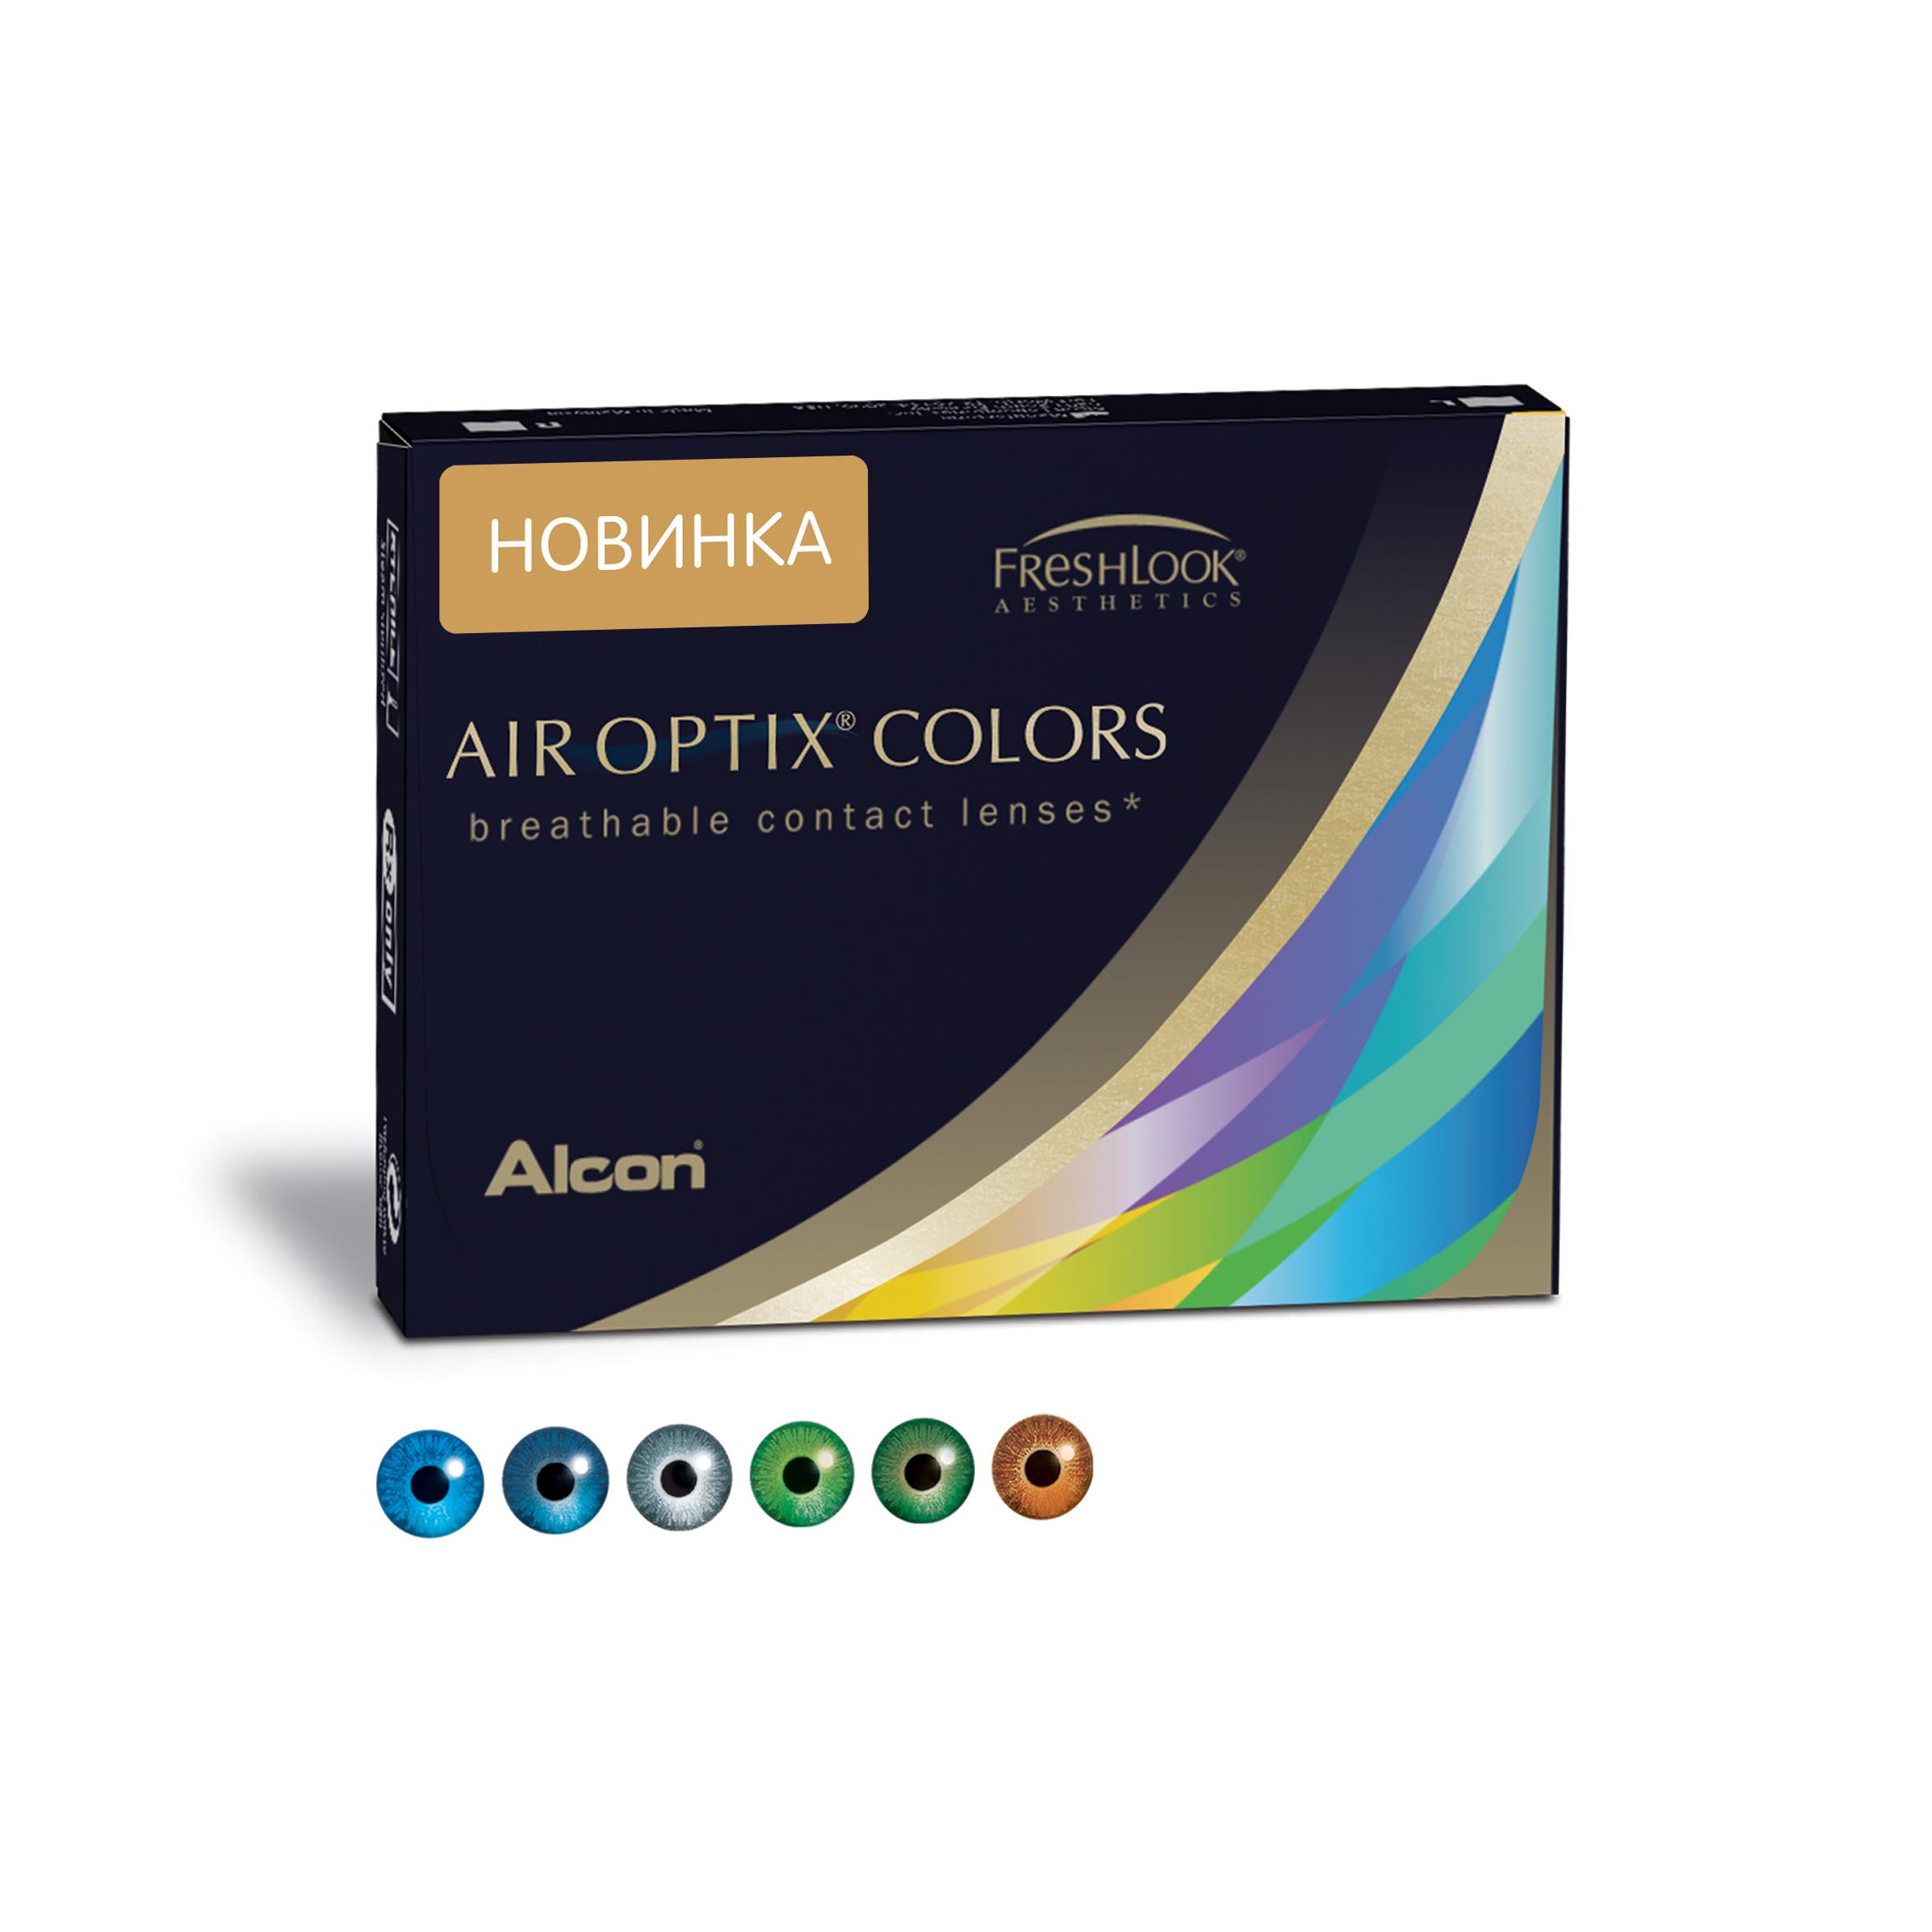 Аlcon контактные линзы Air Optix Colors 2 шт -5.50 Sterling Gray31746291Мягкие контактные линзы